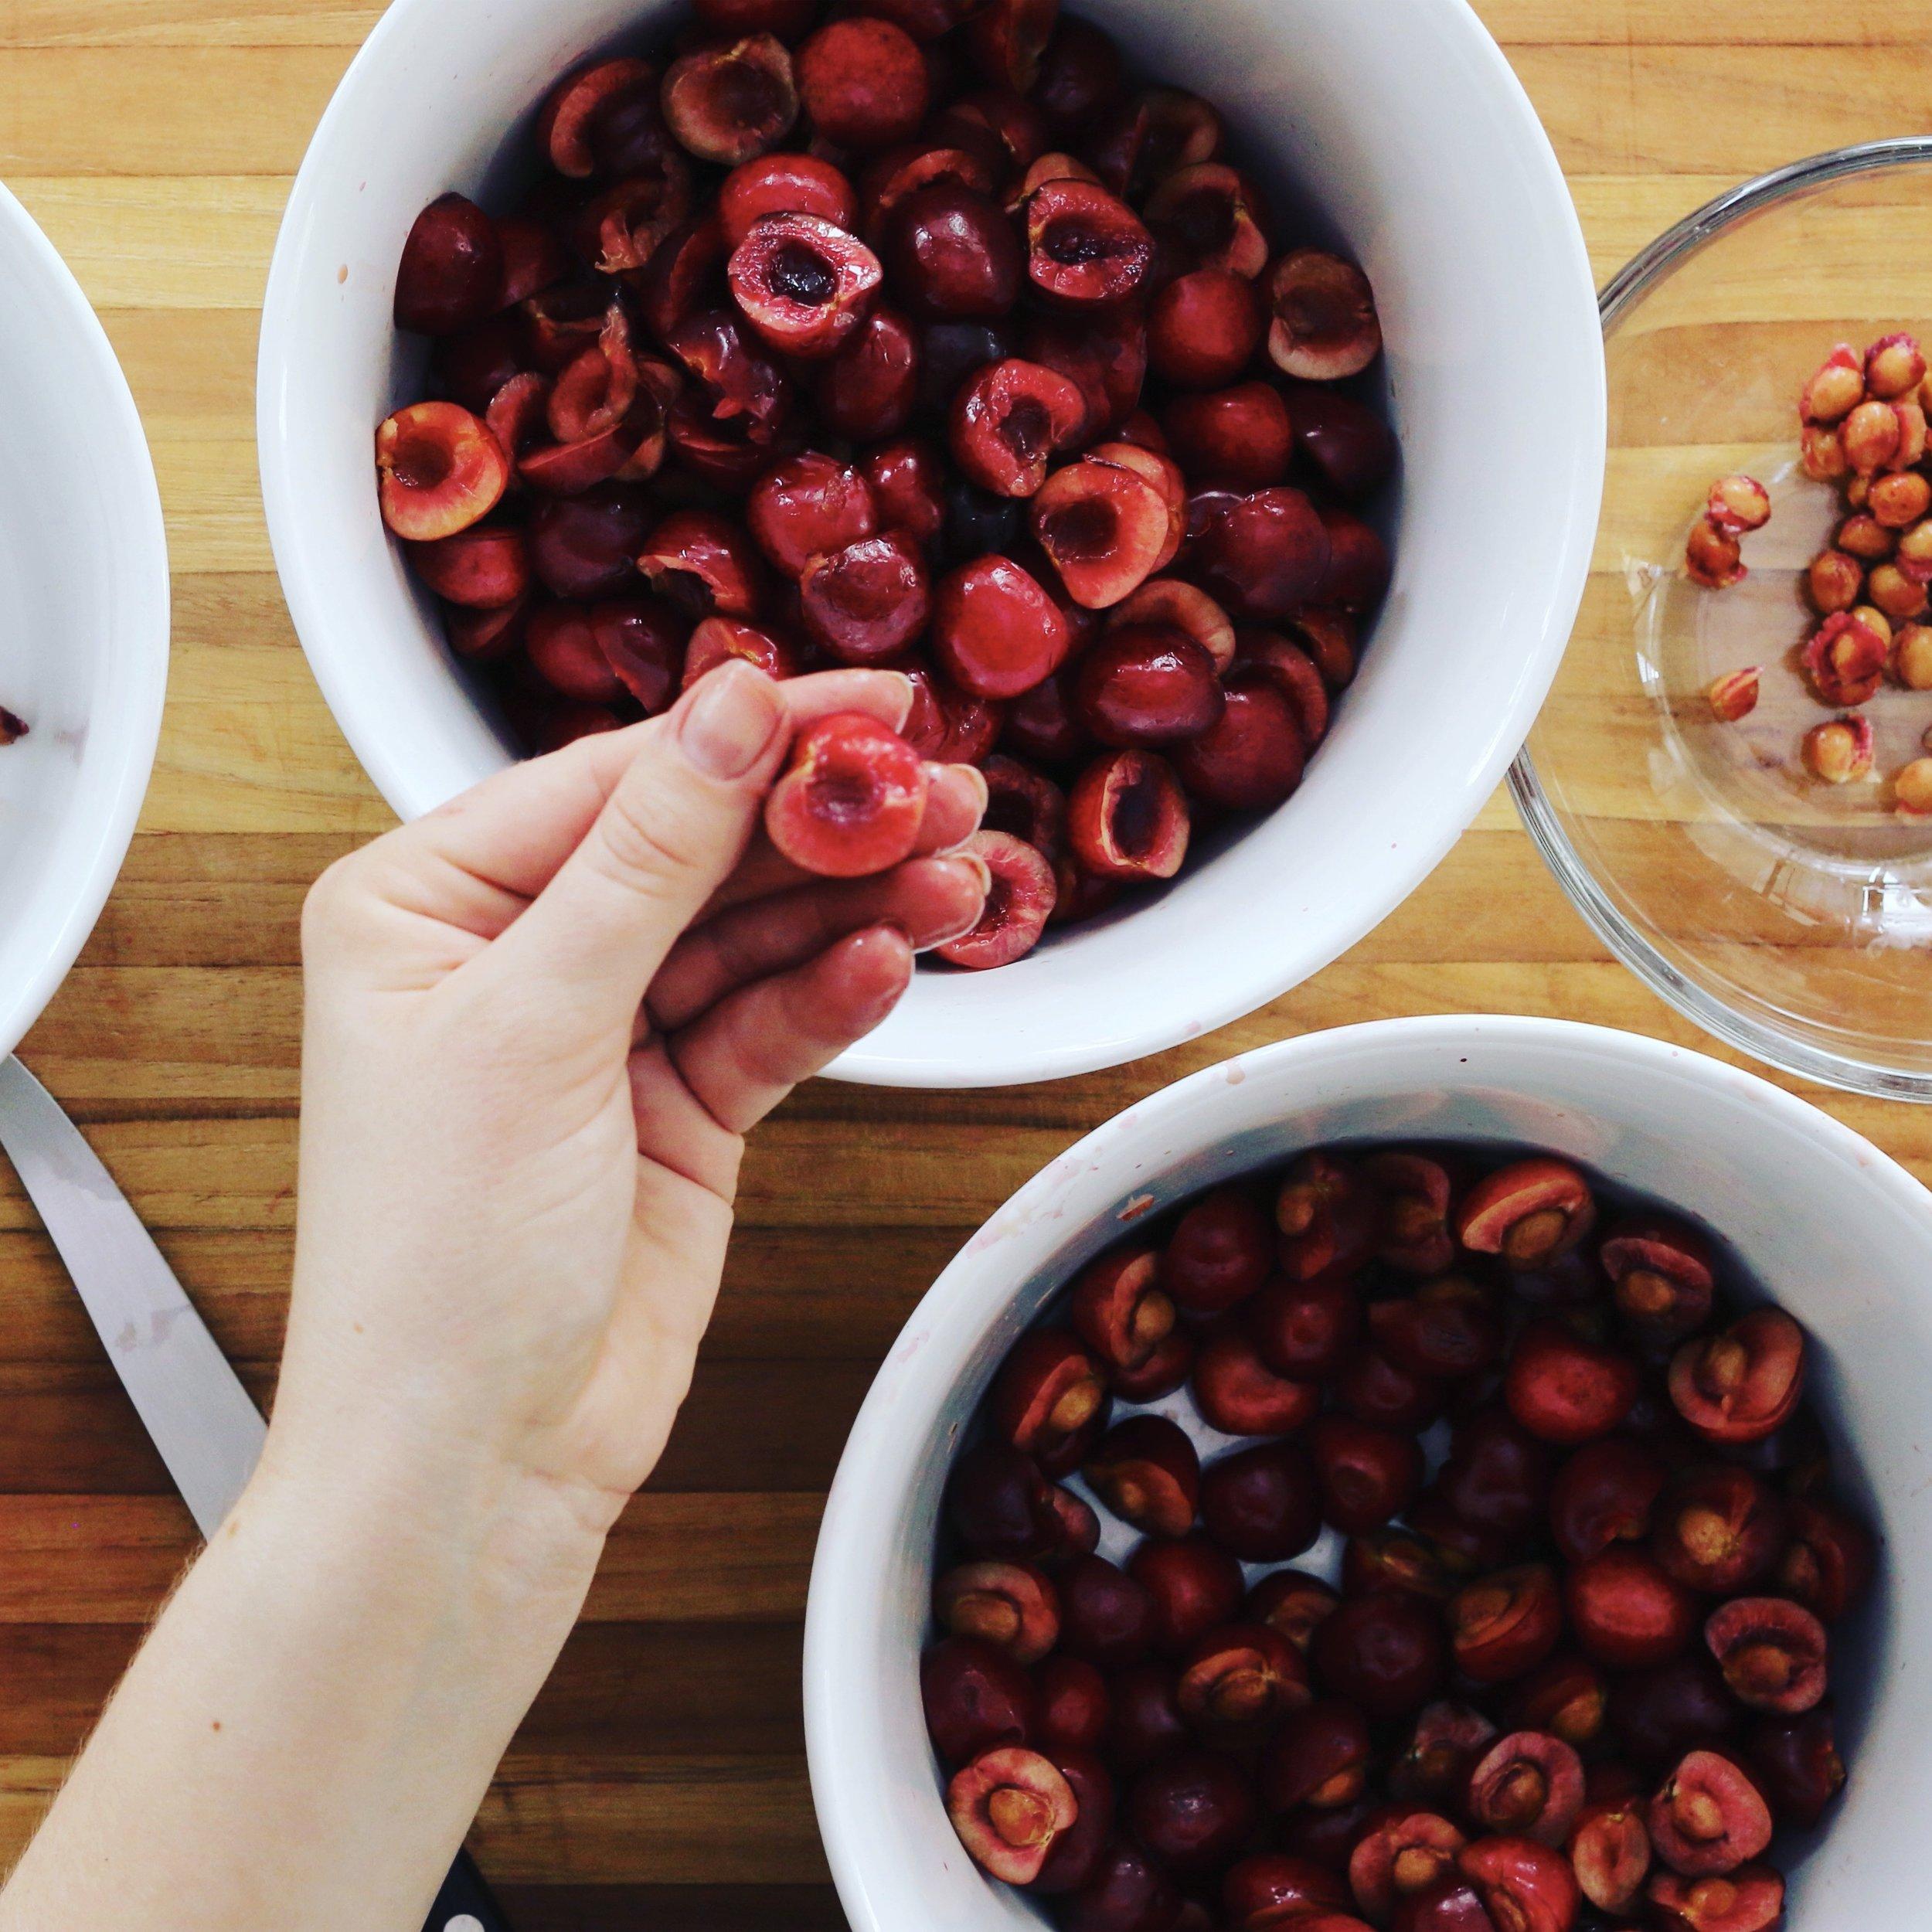 Processing Cherries